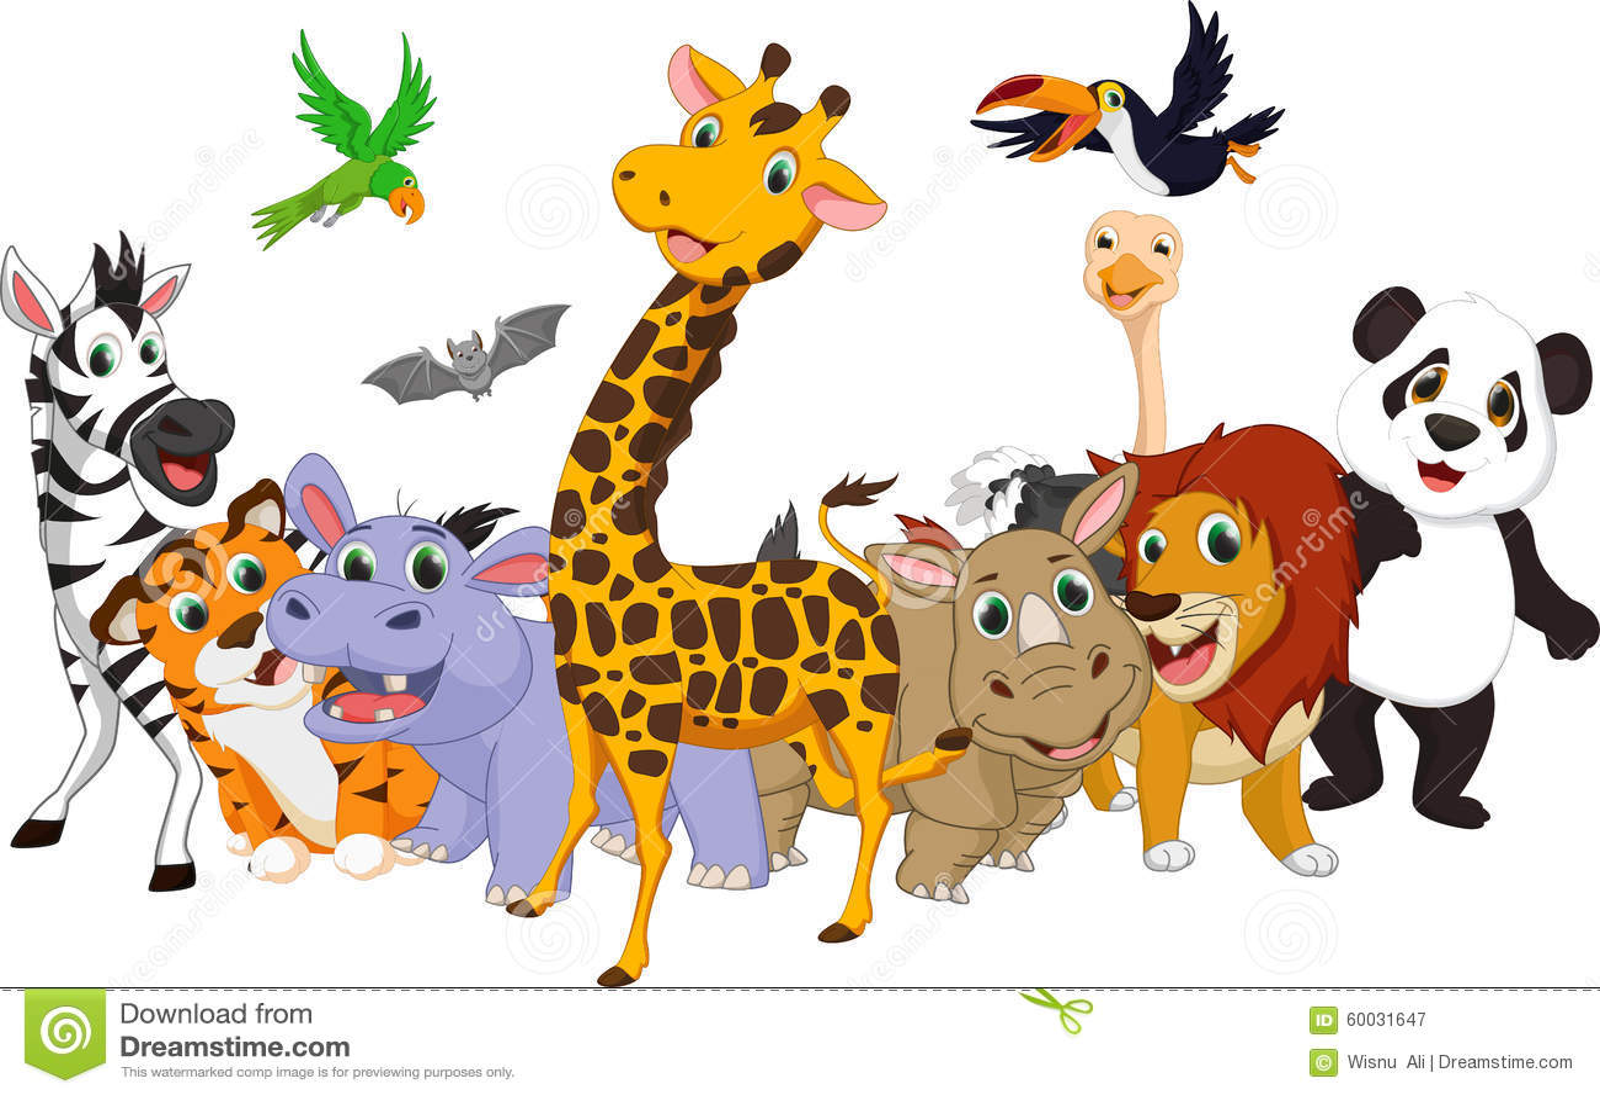 Animaux sauvages de dessin anim illustration de vecteur - Dessin animaux sauvages ...